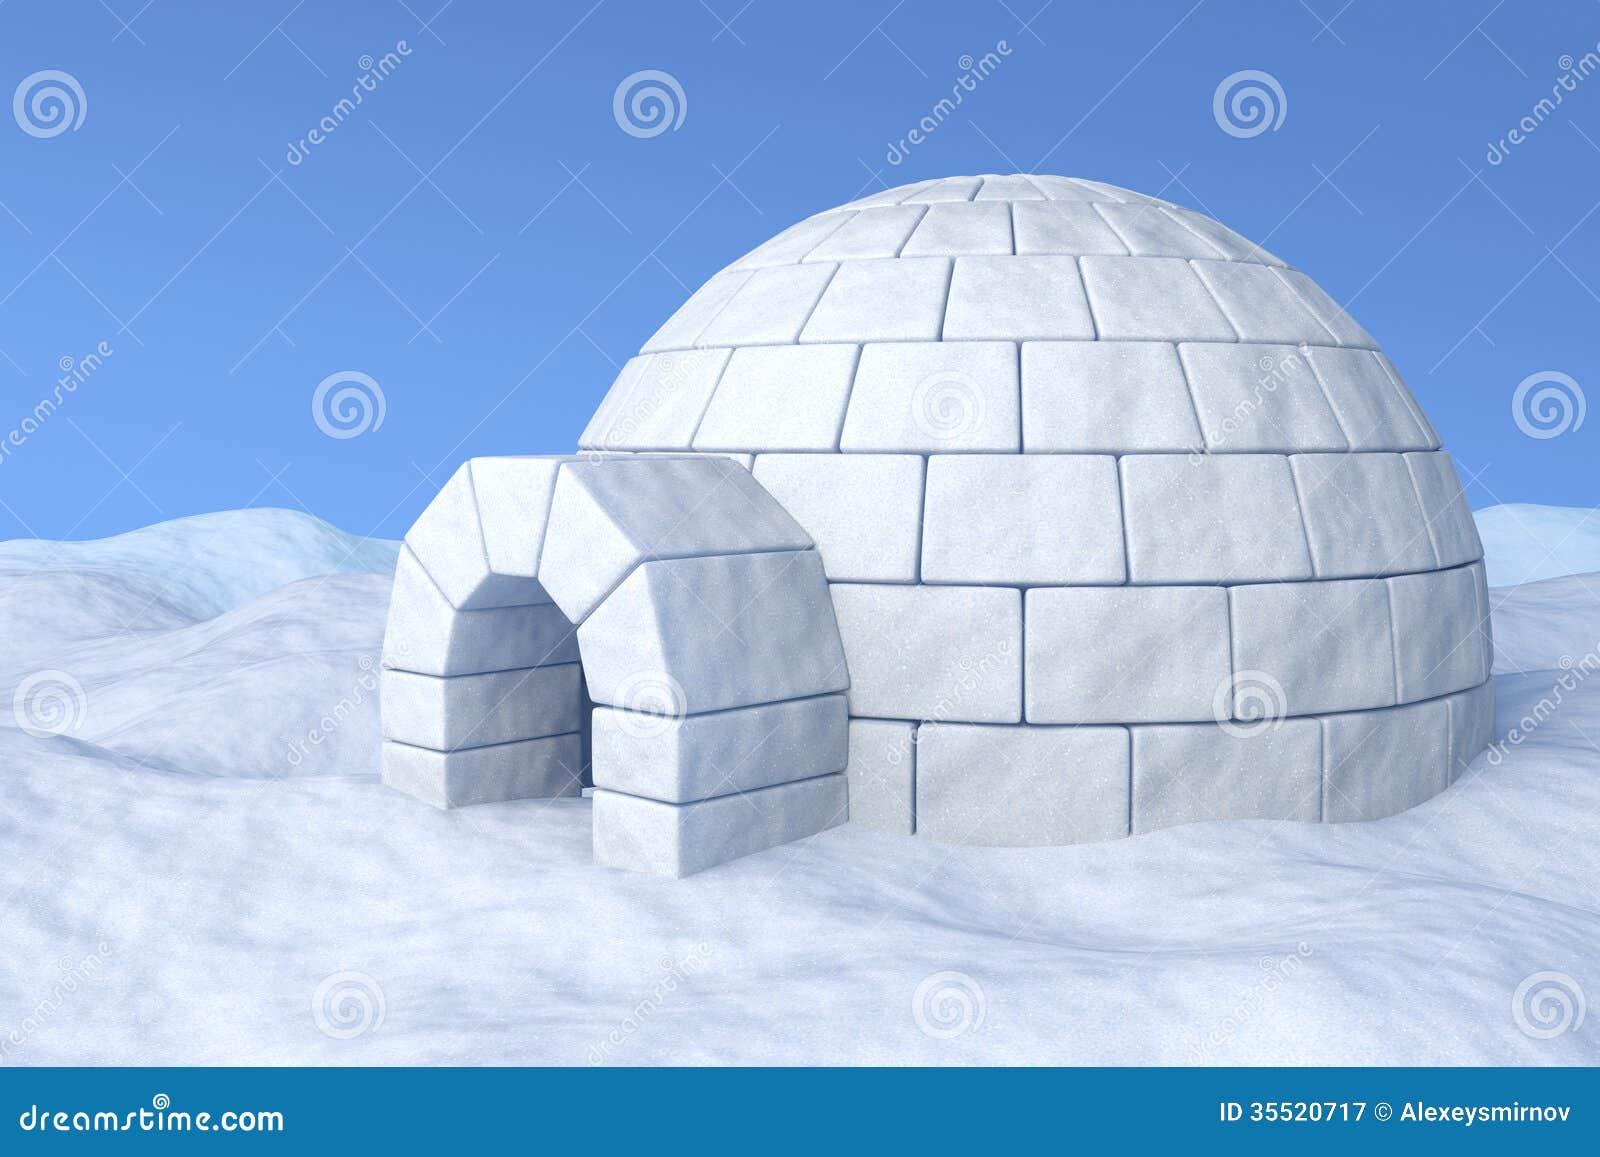 Iglú en nieve